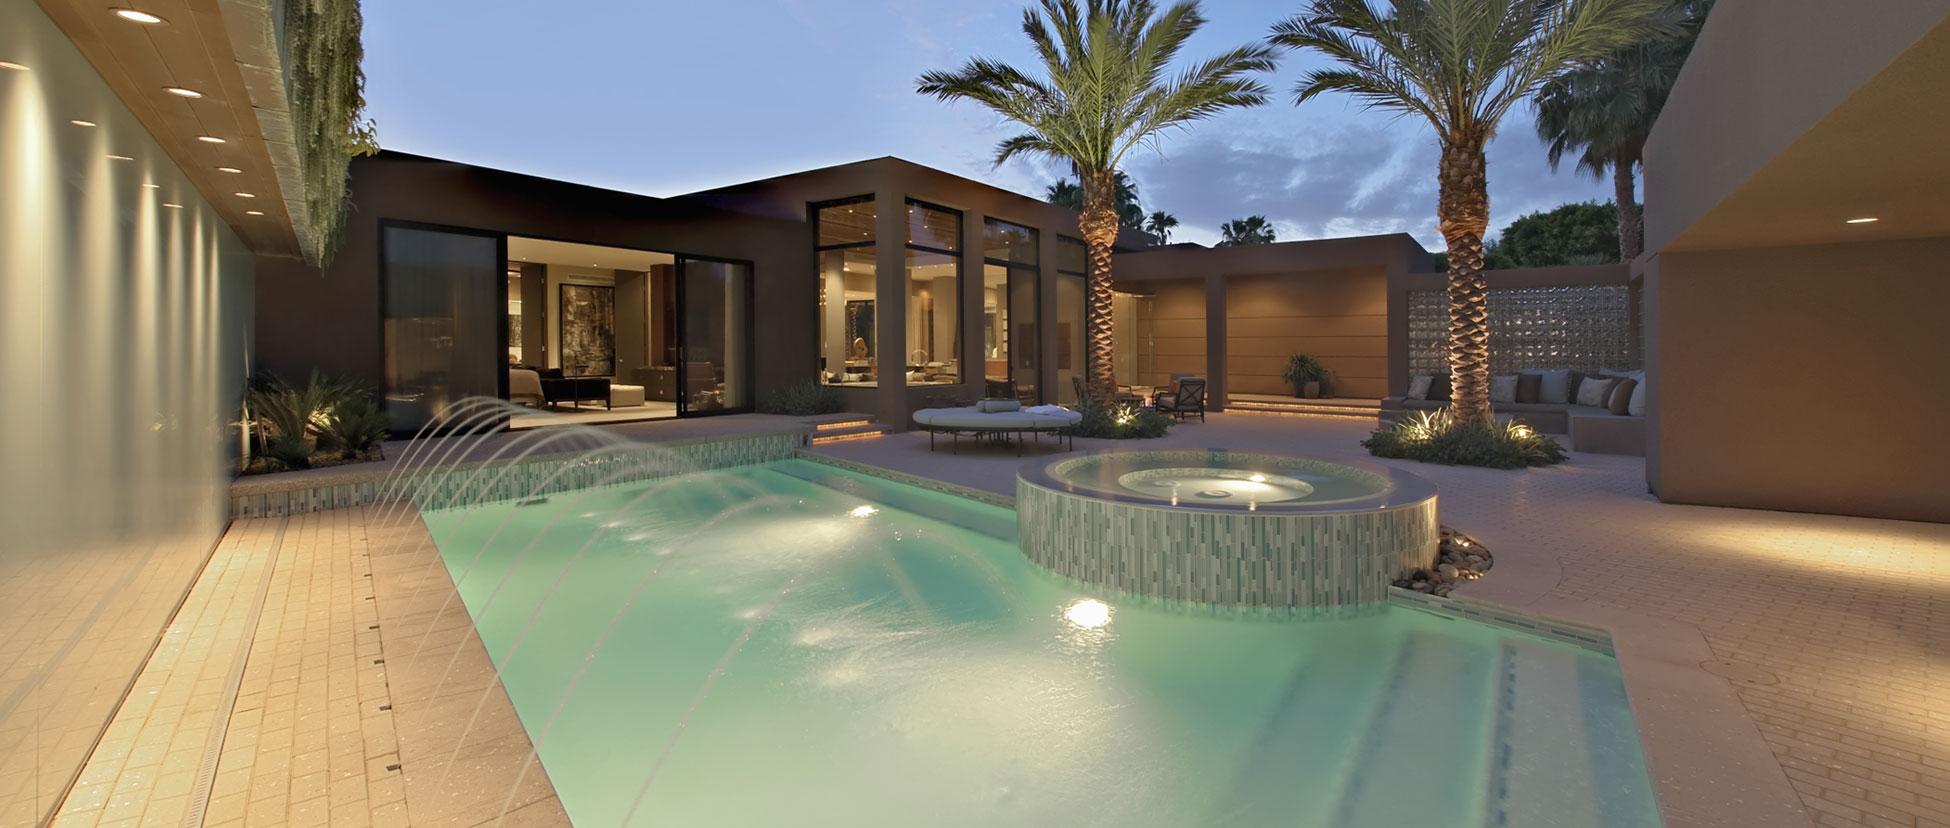 Backyard Paradise: Build Your Paradise With A Full-Service Backyard Design